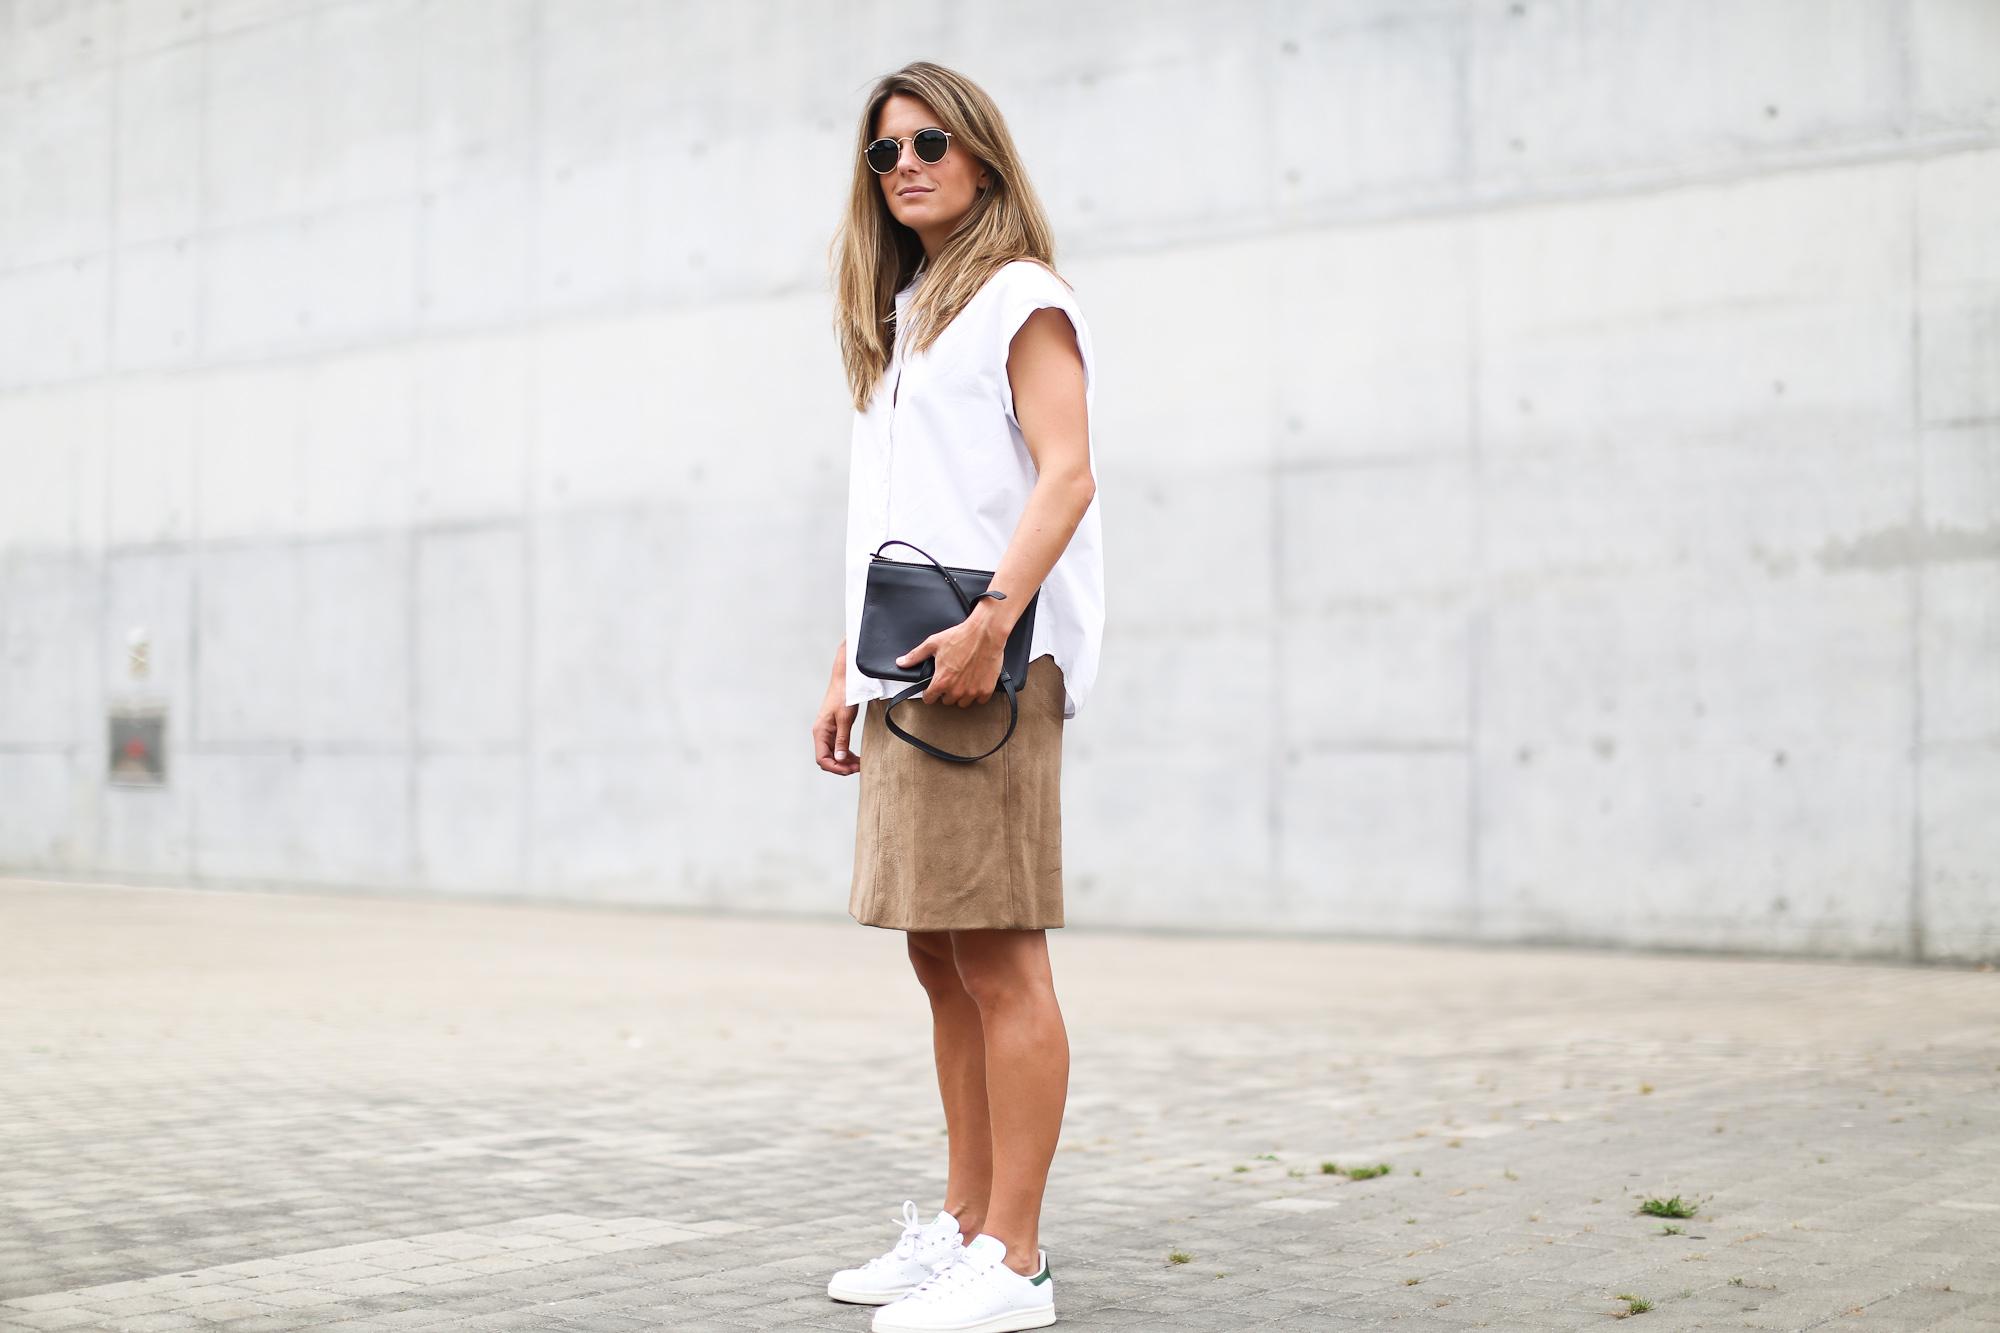 Clochet_suede_skirt_white_shirt_adidas_stan_smith_leztinstreet_celine_trio_bag-5